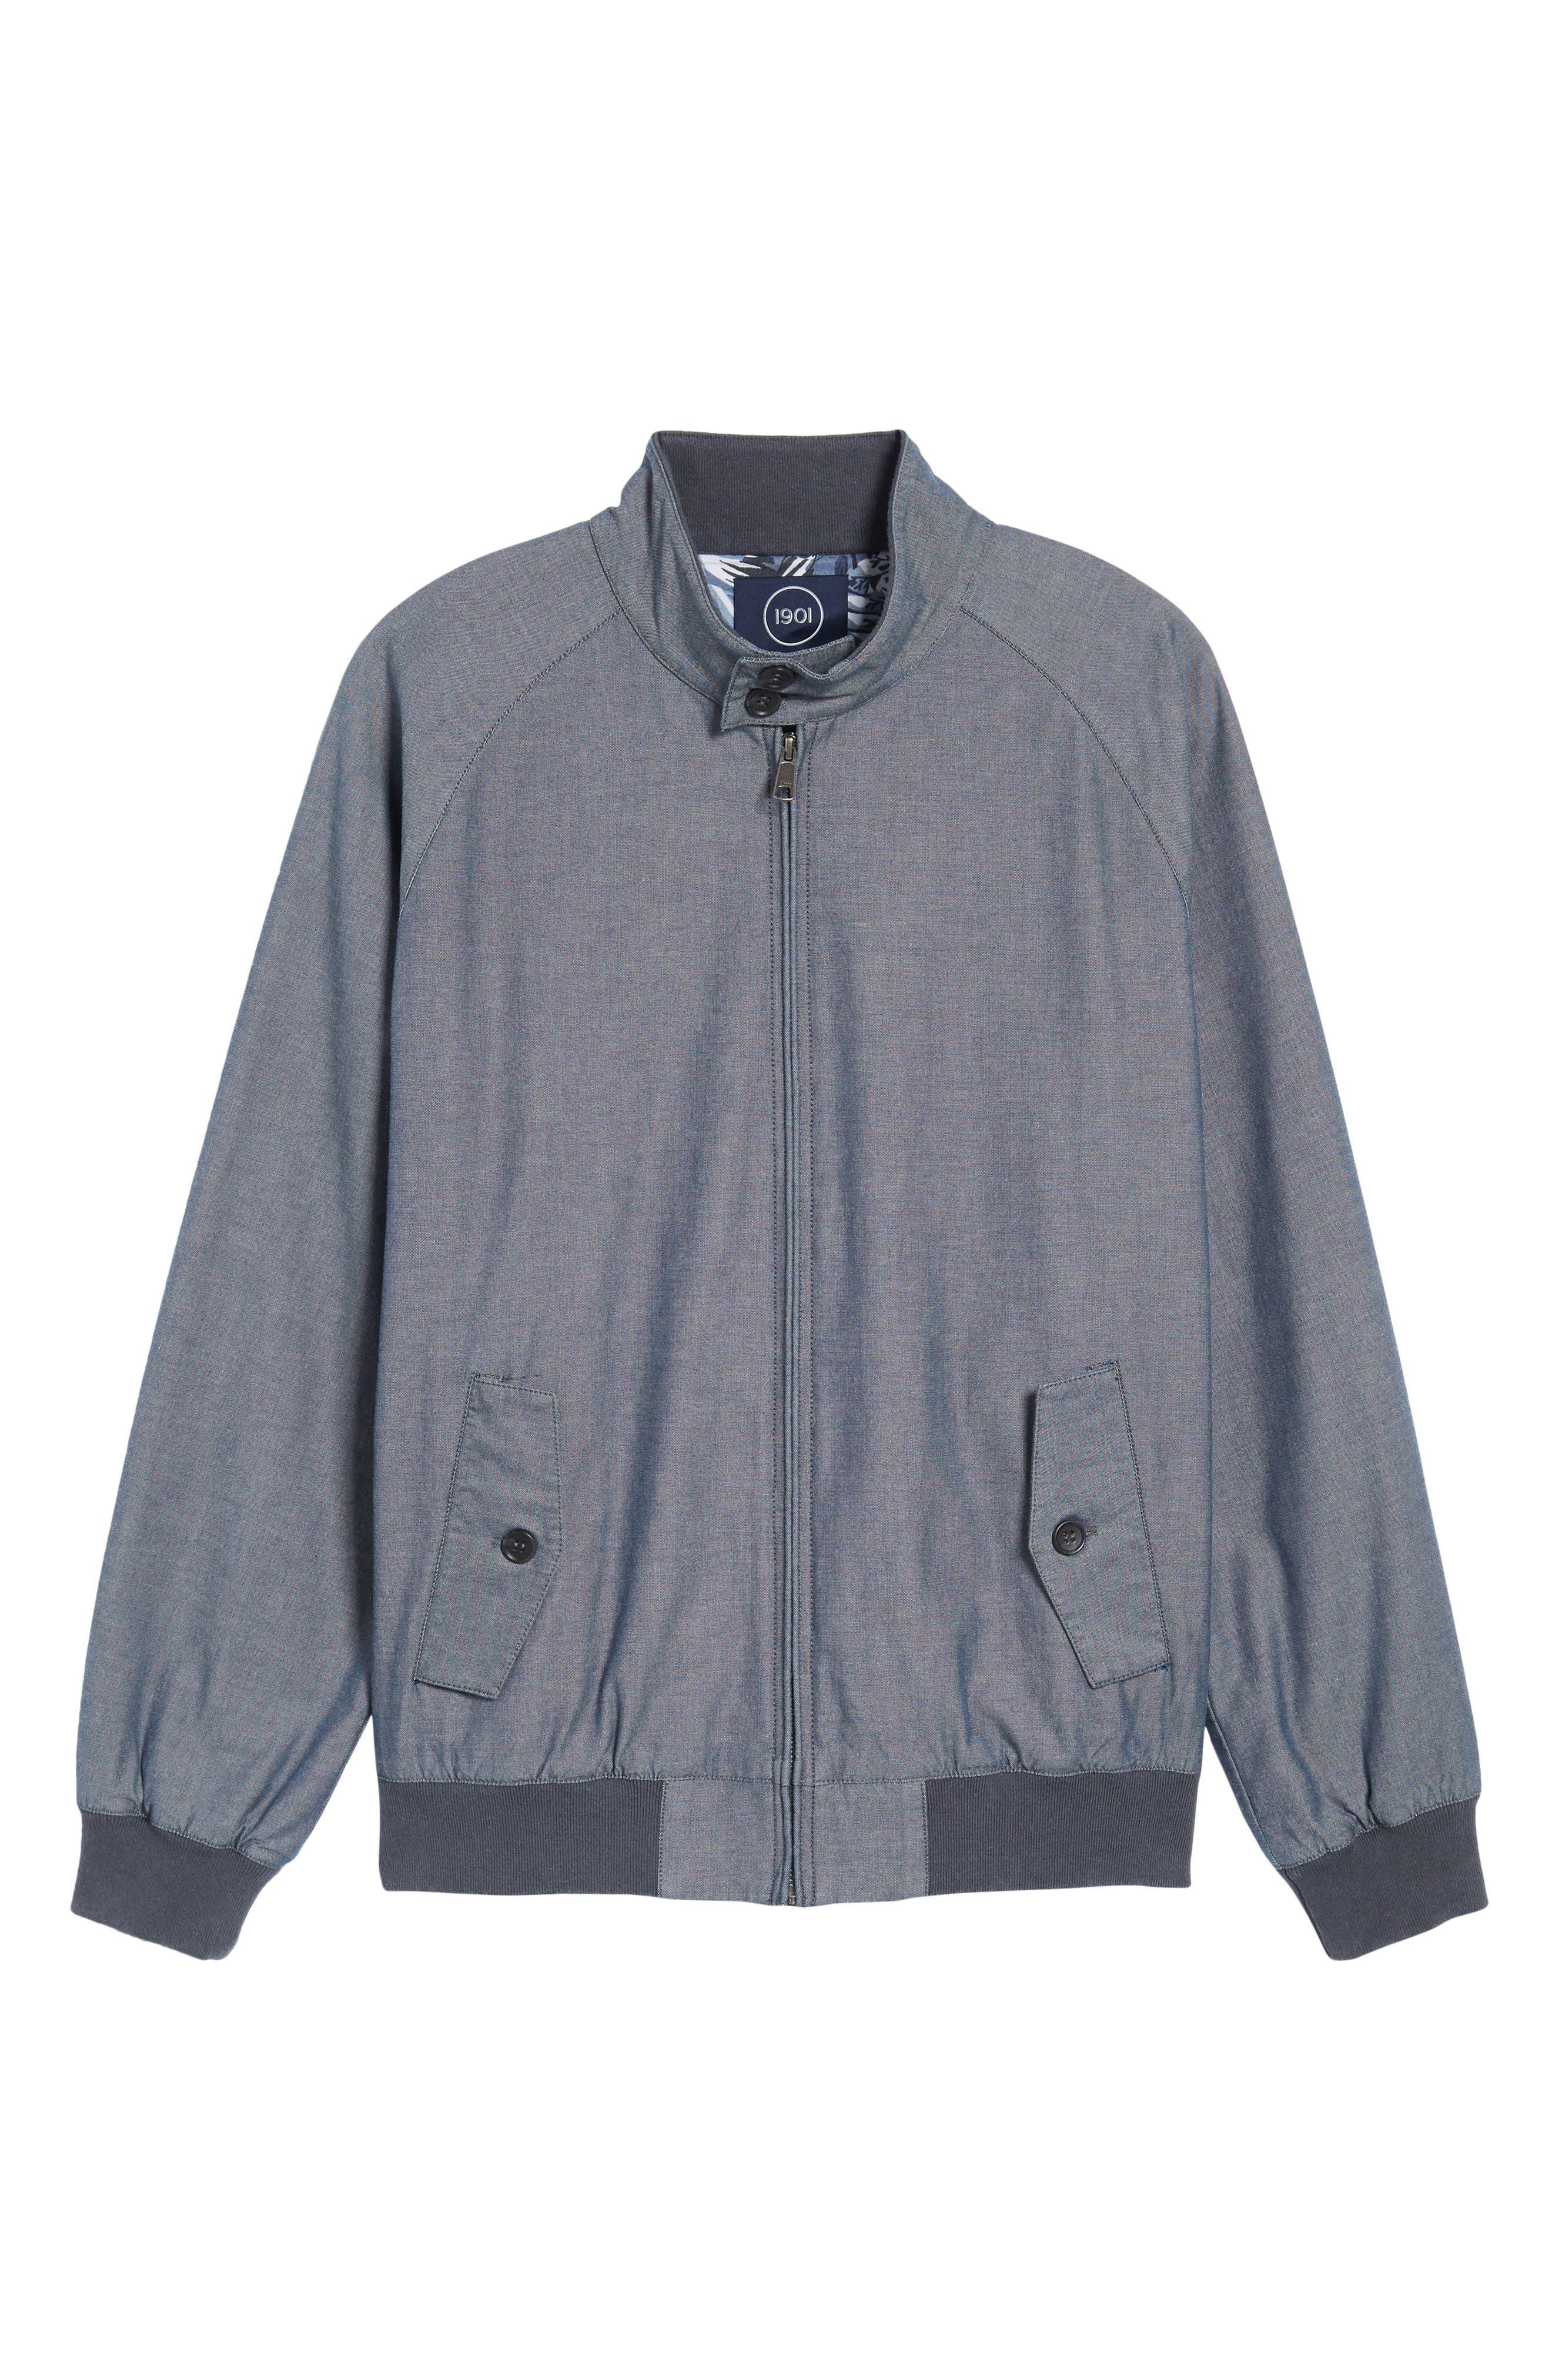 Harrington Jacket,                             Alternate thumbnail 6, color,                             Blue Vintage Chambray